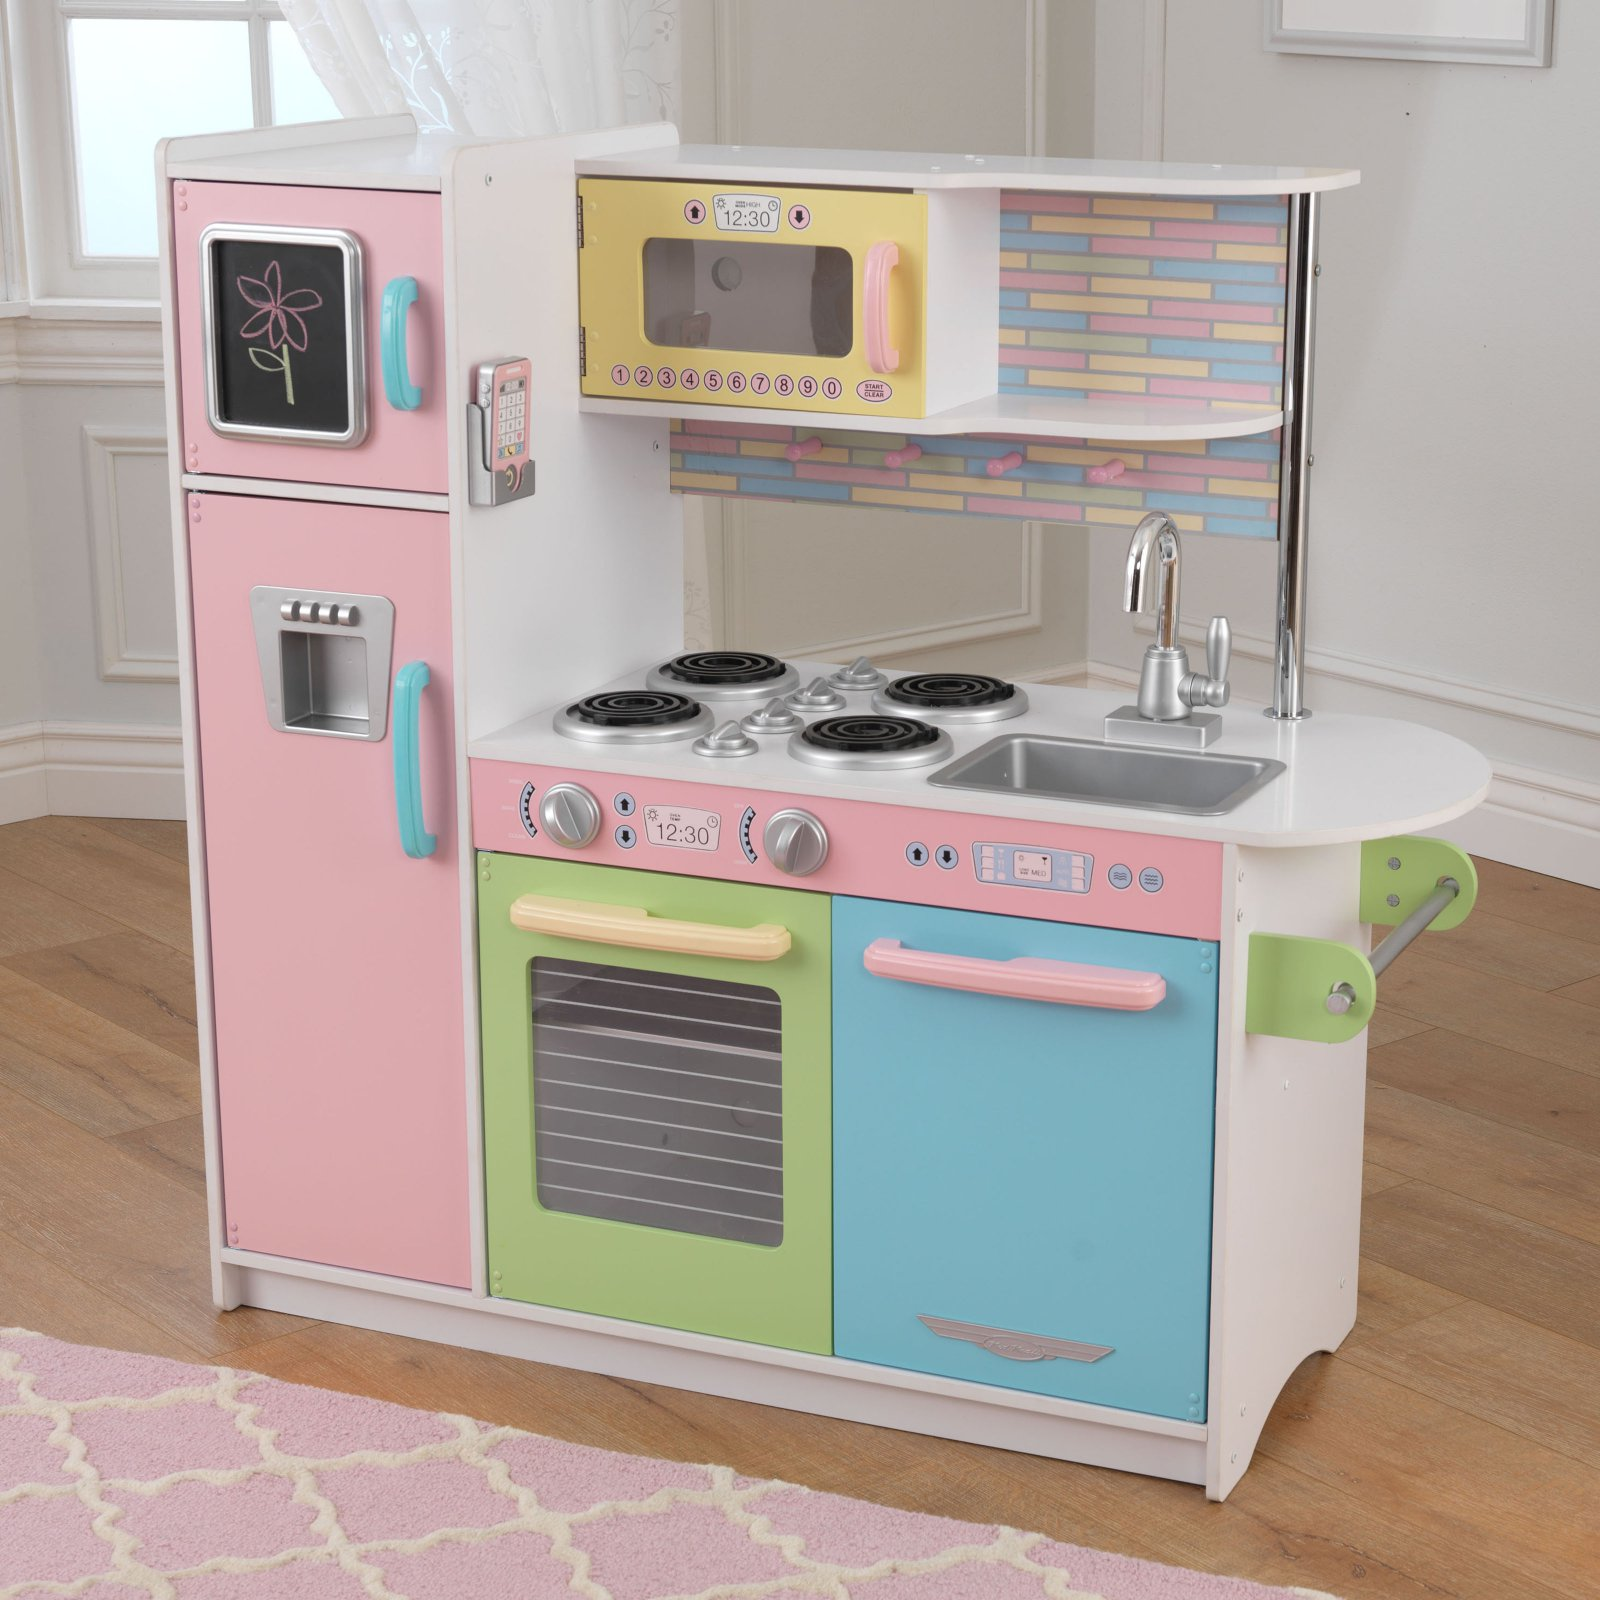 KidKraft Kids Wooden Uptown Pastel Pretend Play Toy Kitchen Pink Cooking Playset by KidKraft